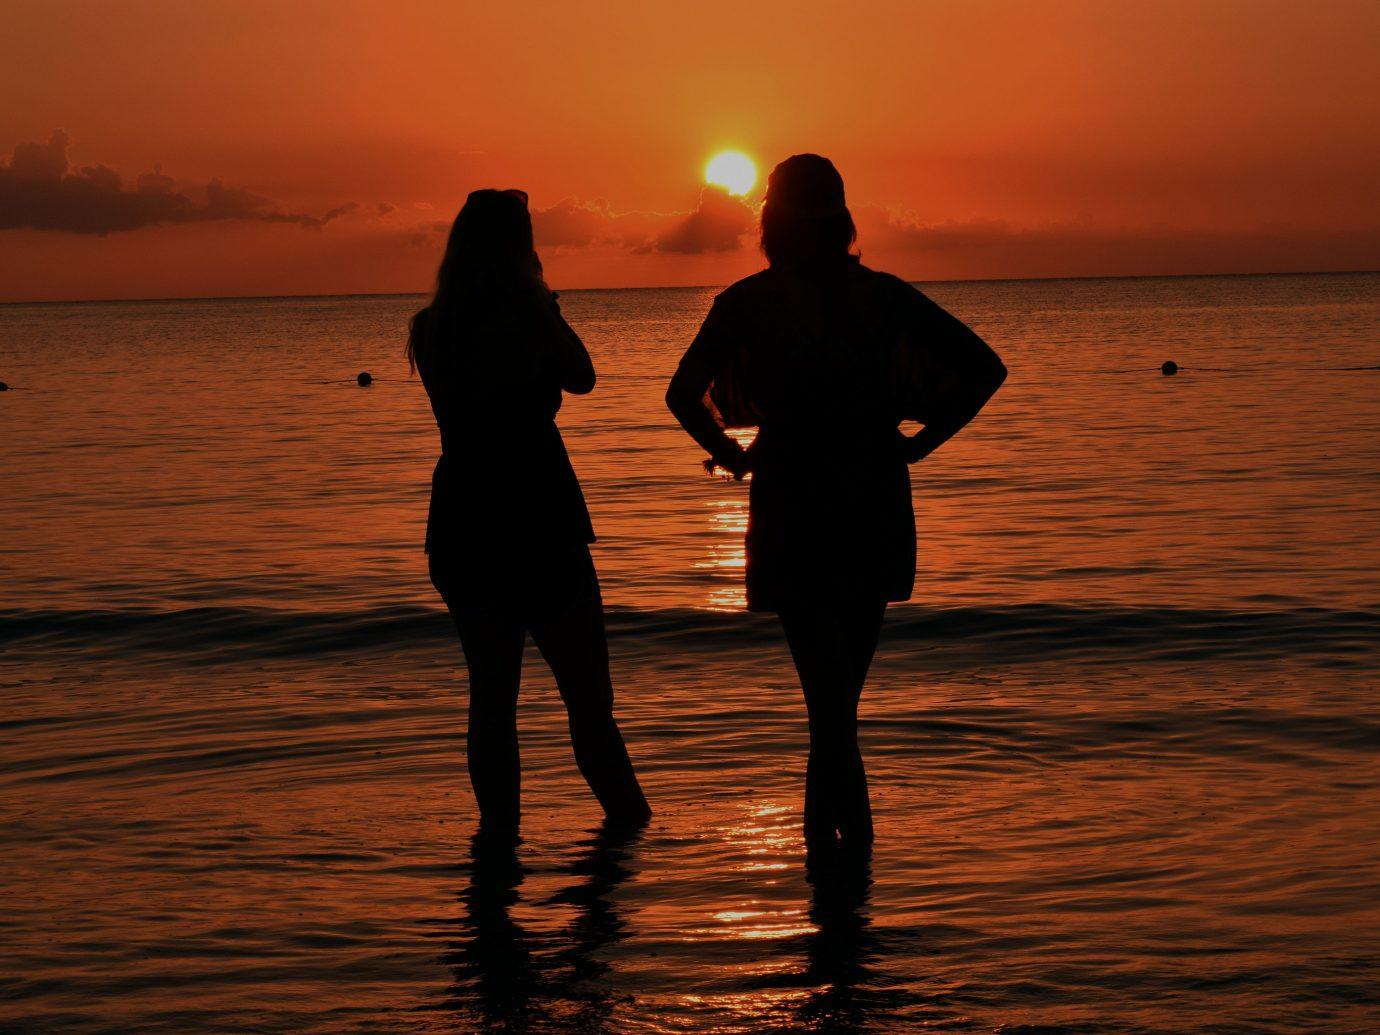 Hotels water outdoor sky Sunset Beach ground person Sea horizon Ocean Sun reflection silhouette morning evening sunrise dawn dusk sunlight Coast wave shore distance